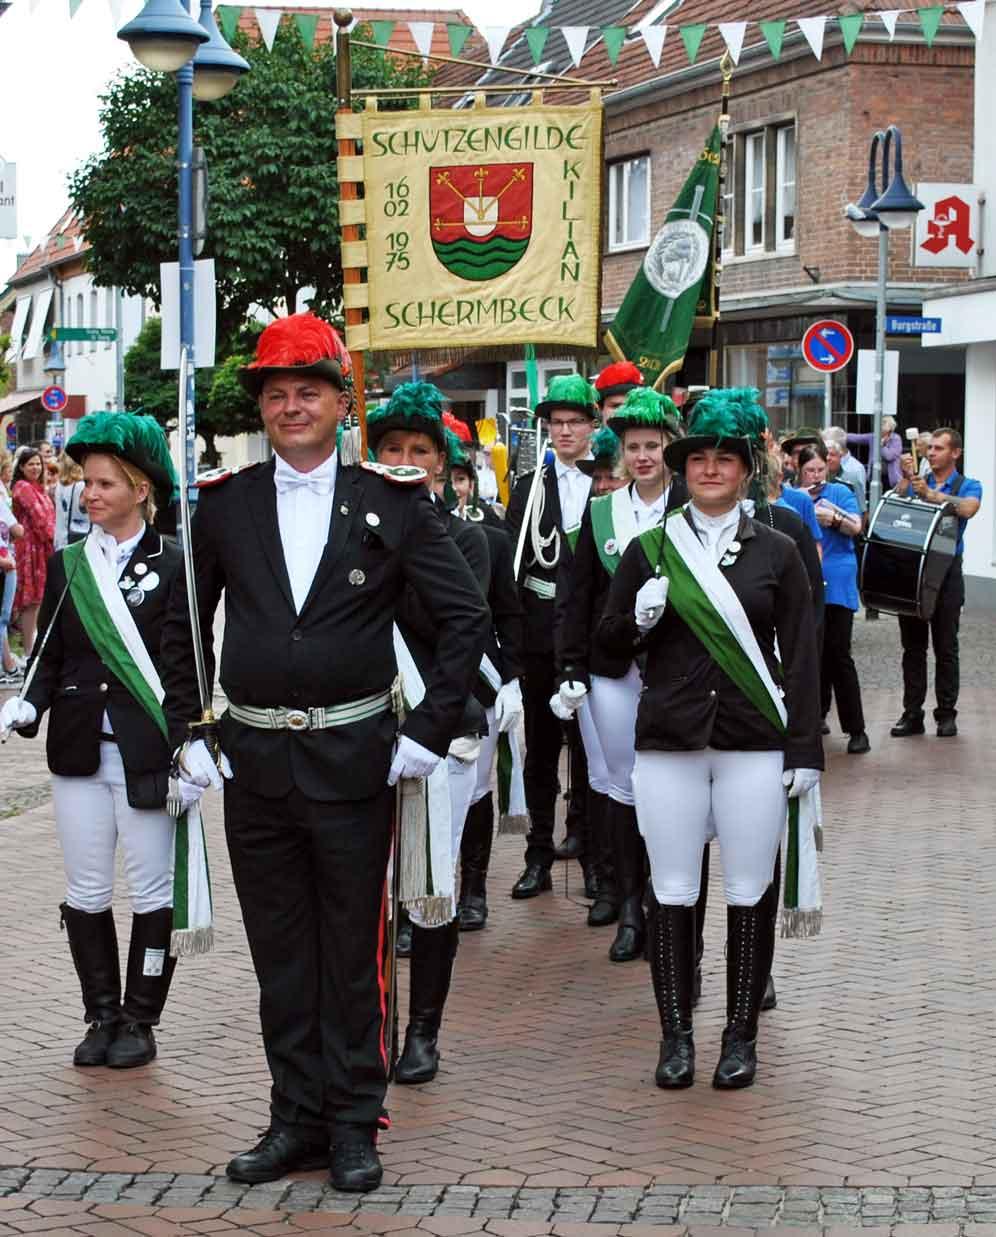 Kiliangilde Schermbeck Schuetzenfest 2021